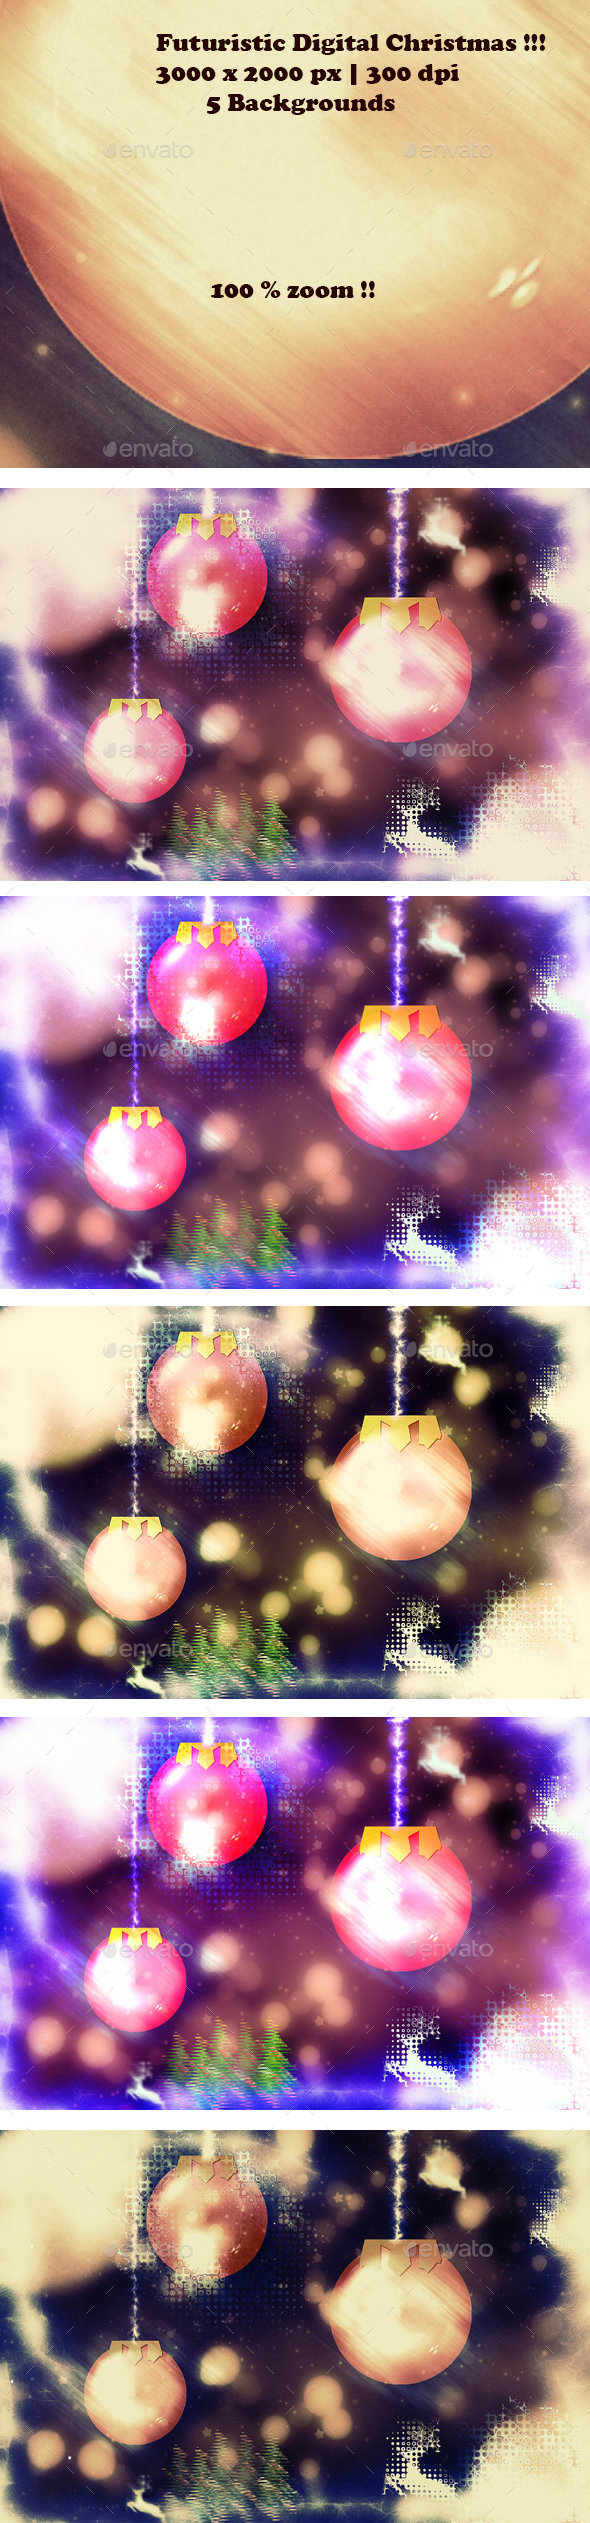 Futuristic Digital Christmas Backgrounds